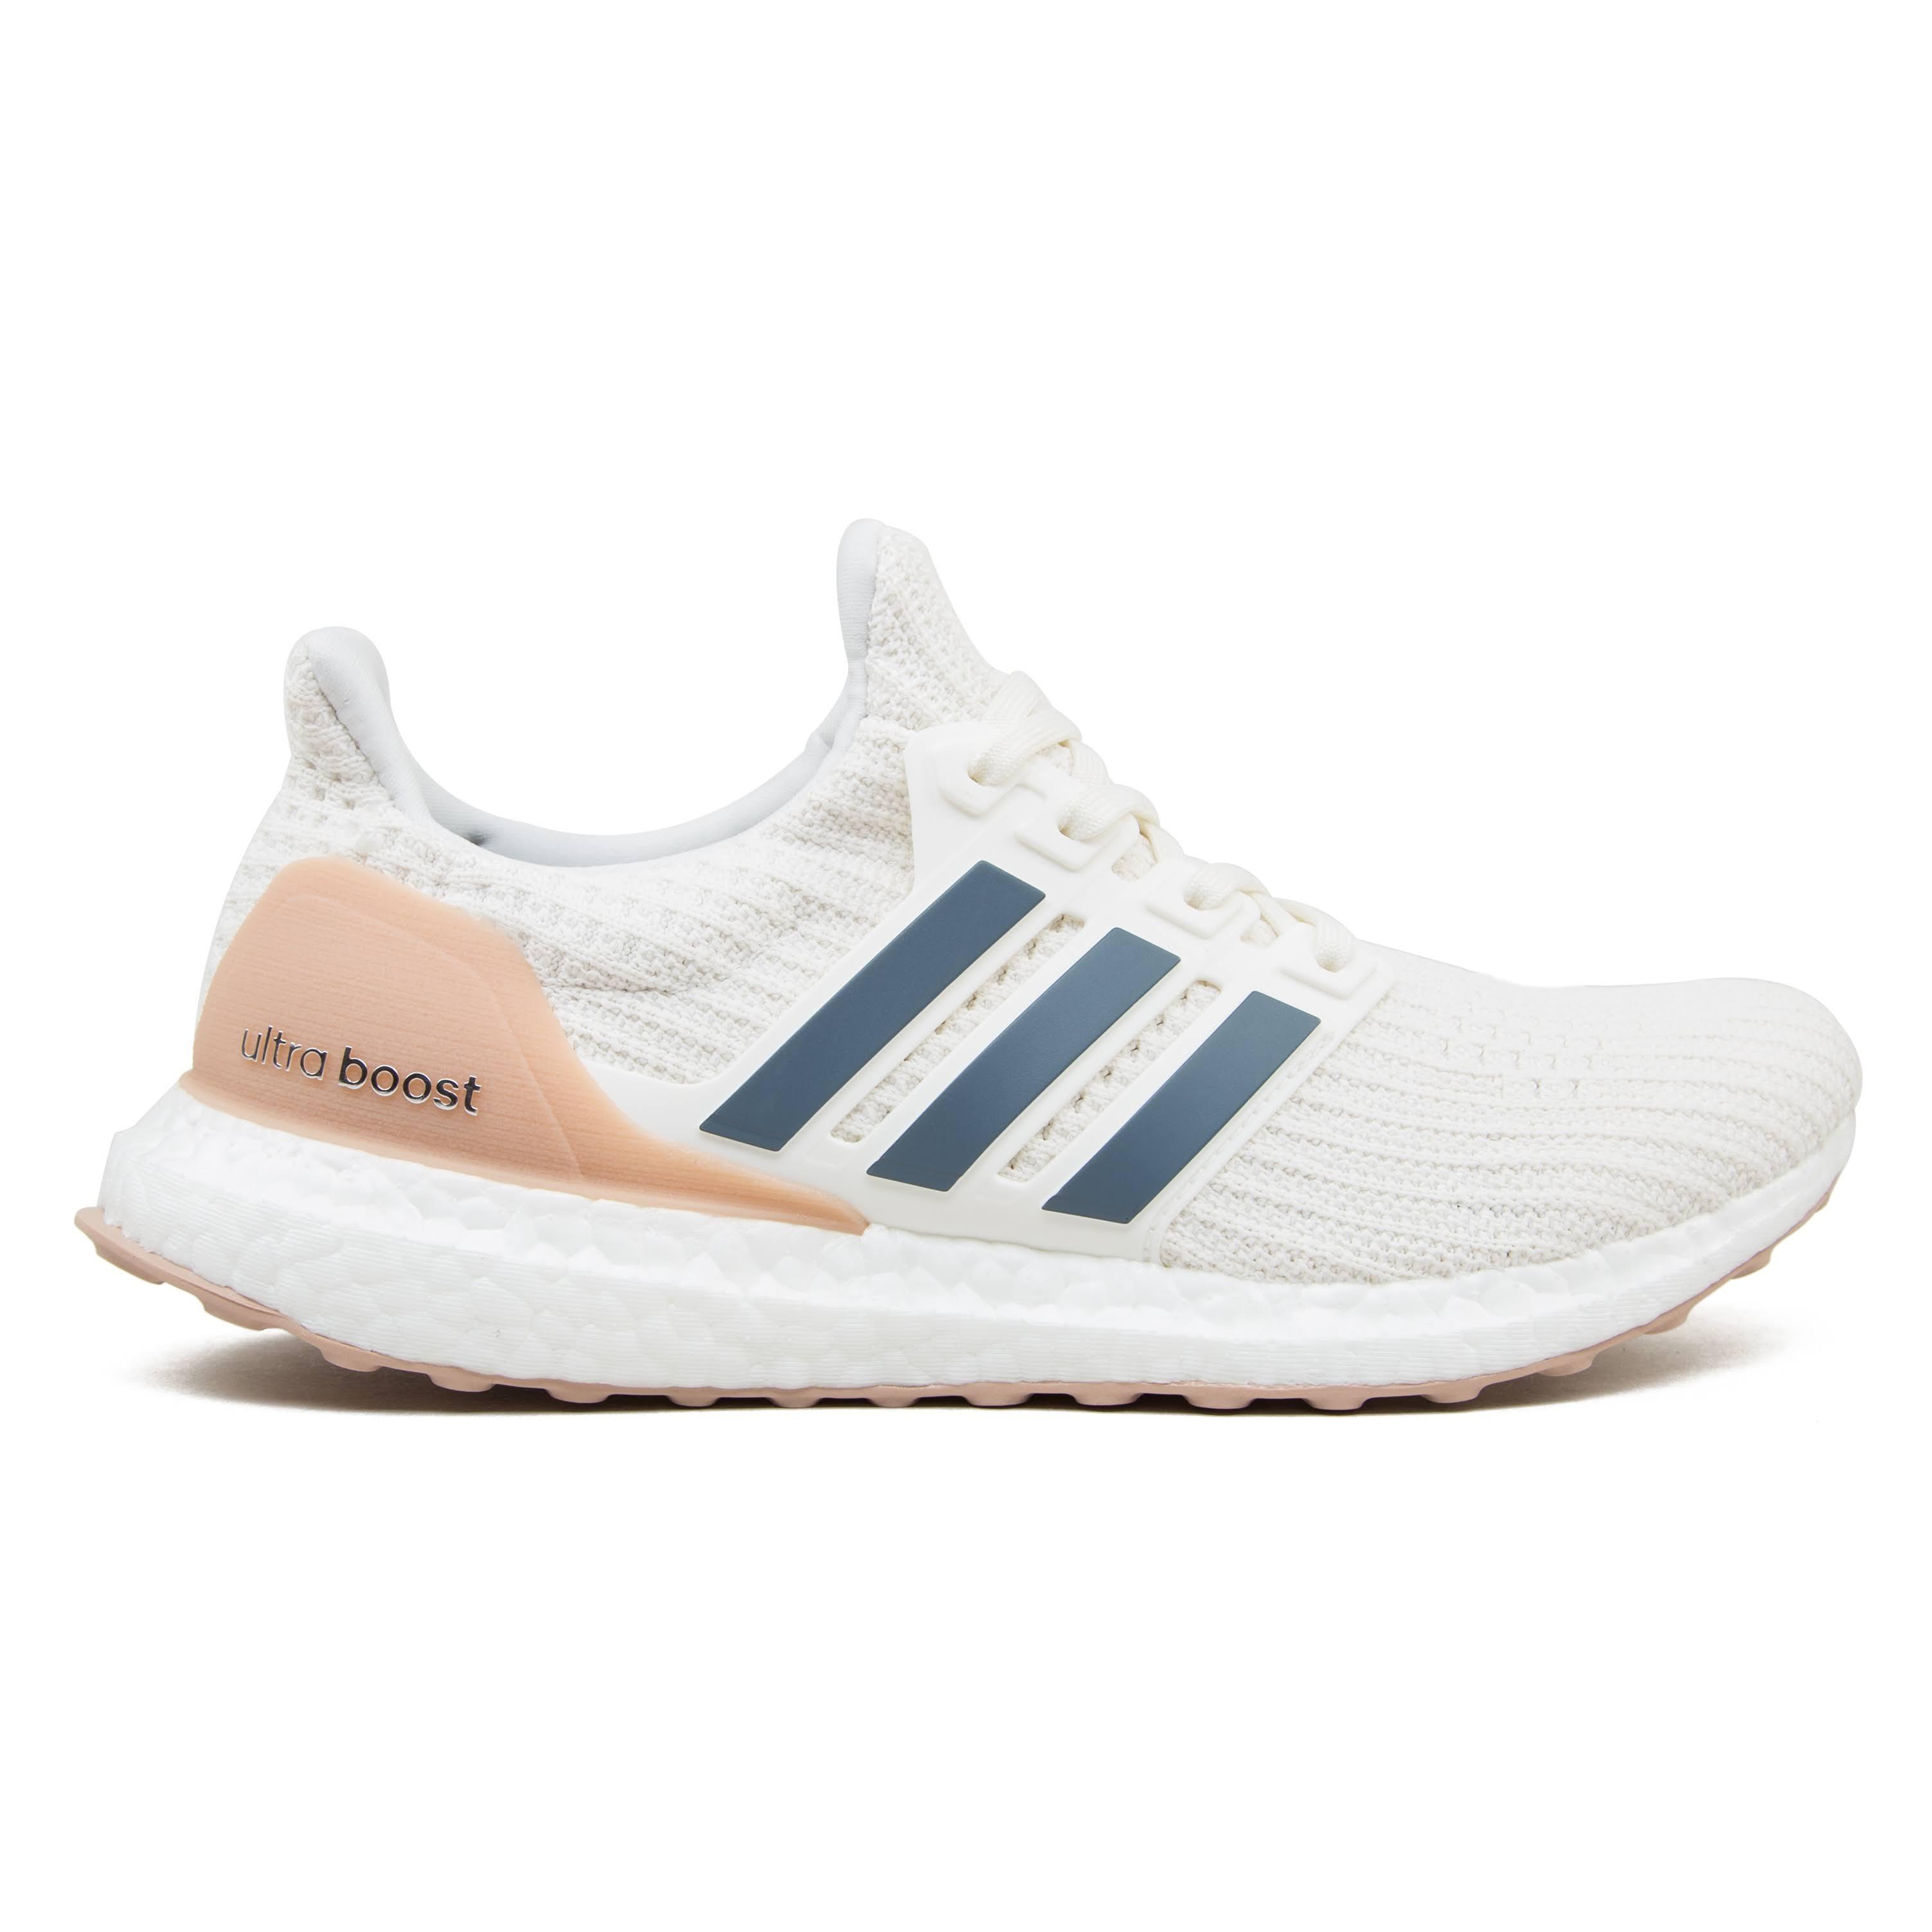 schoenen schoenen Adidas witmarine Ultraboost Ultraboost Adidas witmarine witmarine schoenen Adidas Ultraboost oWCrdxeB